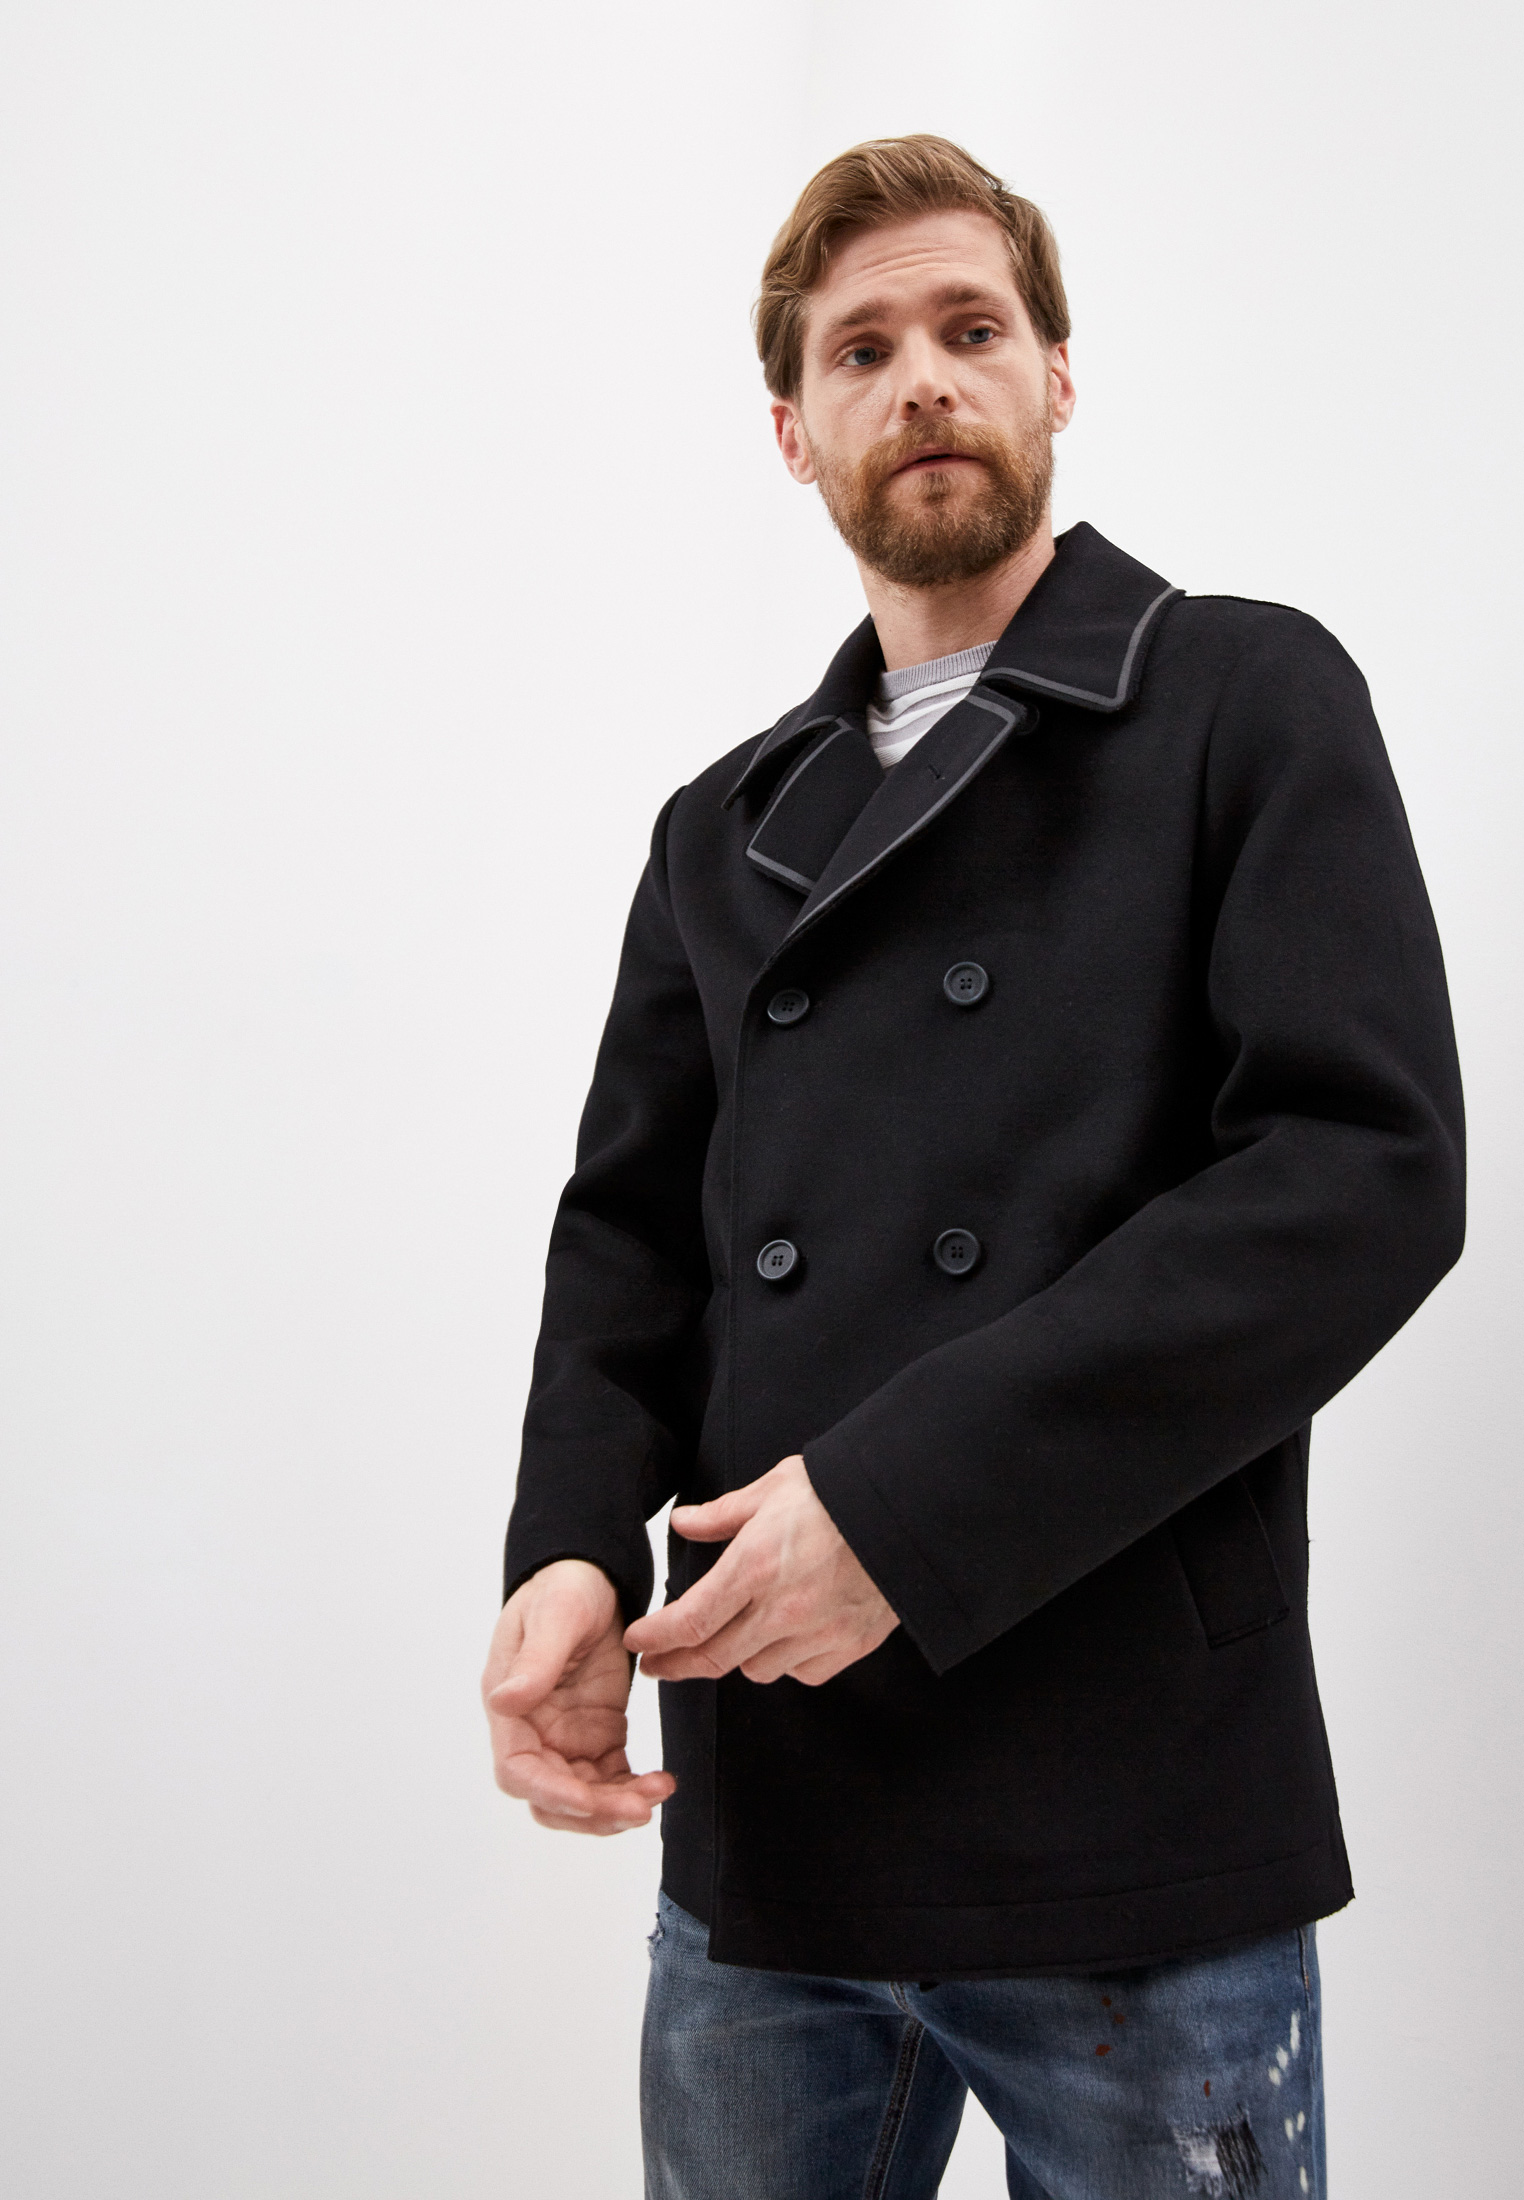 Мужское пальто Bikkembergs (Биккембергс) C J 005 01 T 9220: изображение 1